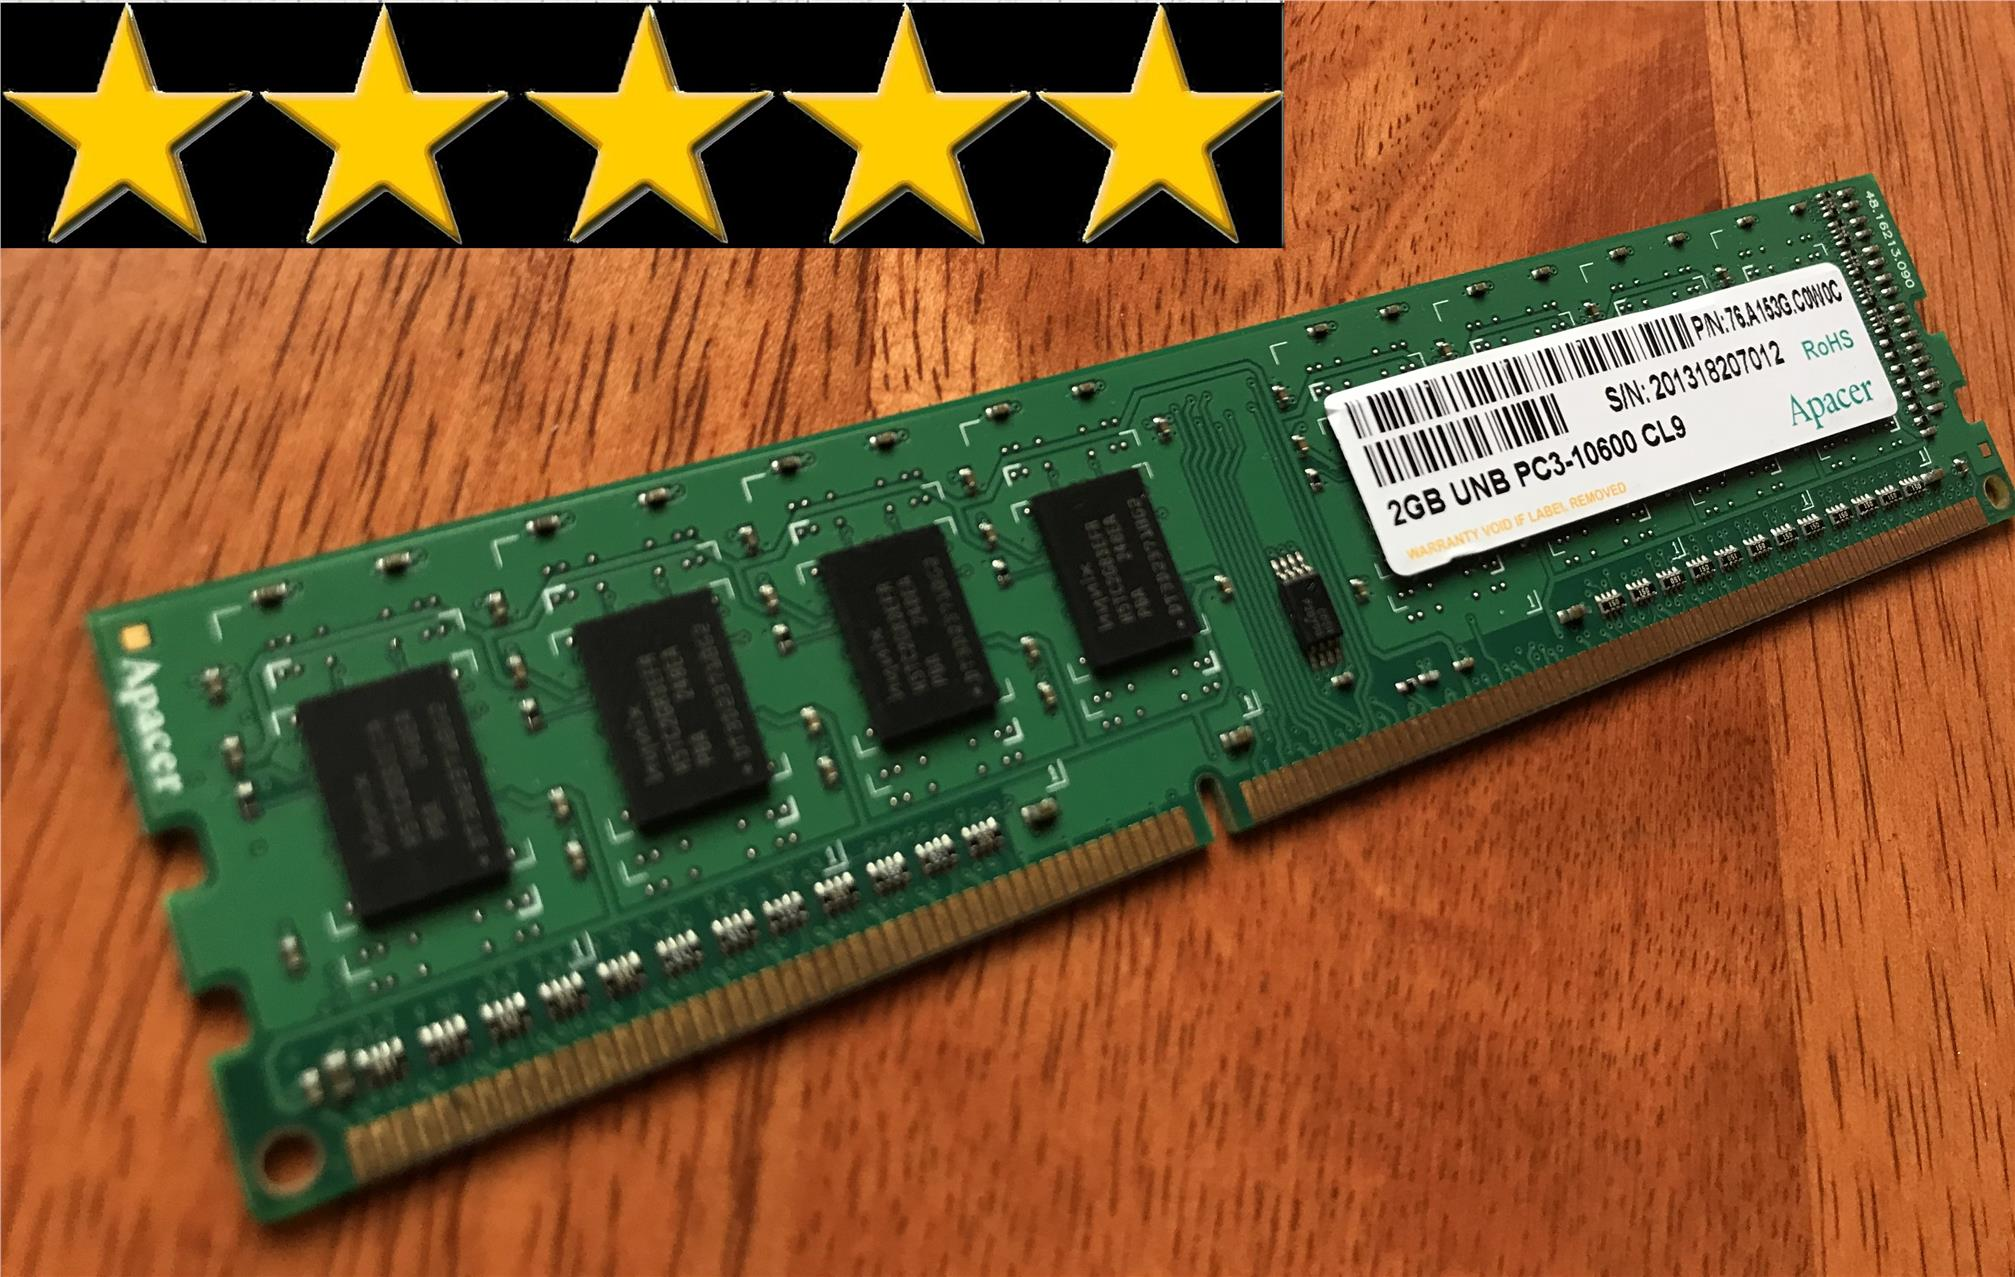 Apacer 2gb Ddr3 1333 Mhz Pc3 10600 End 9 11 2019 1031 Pm Ram Pc Smart 16 Chip Desktop